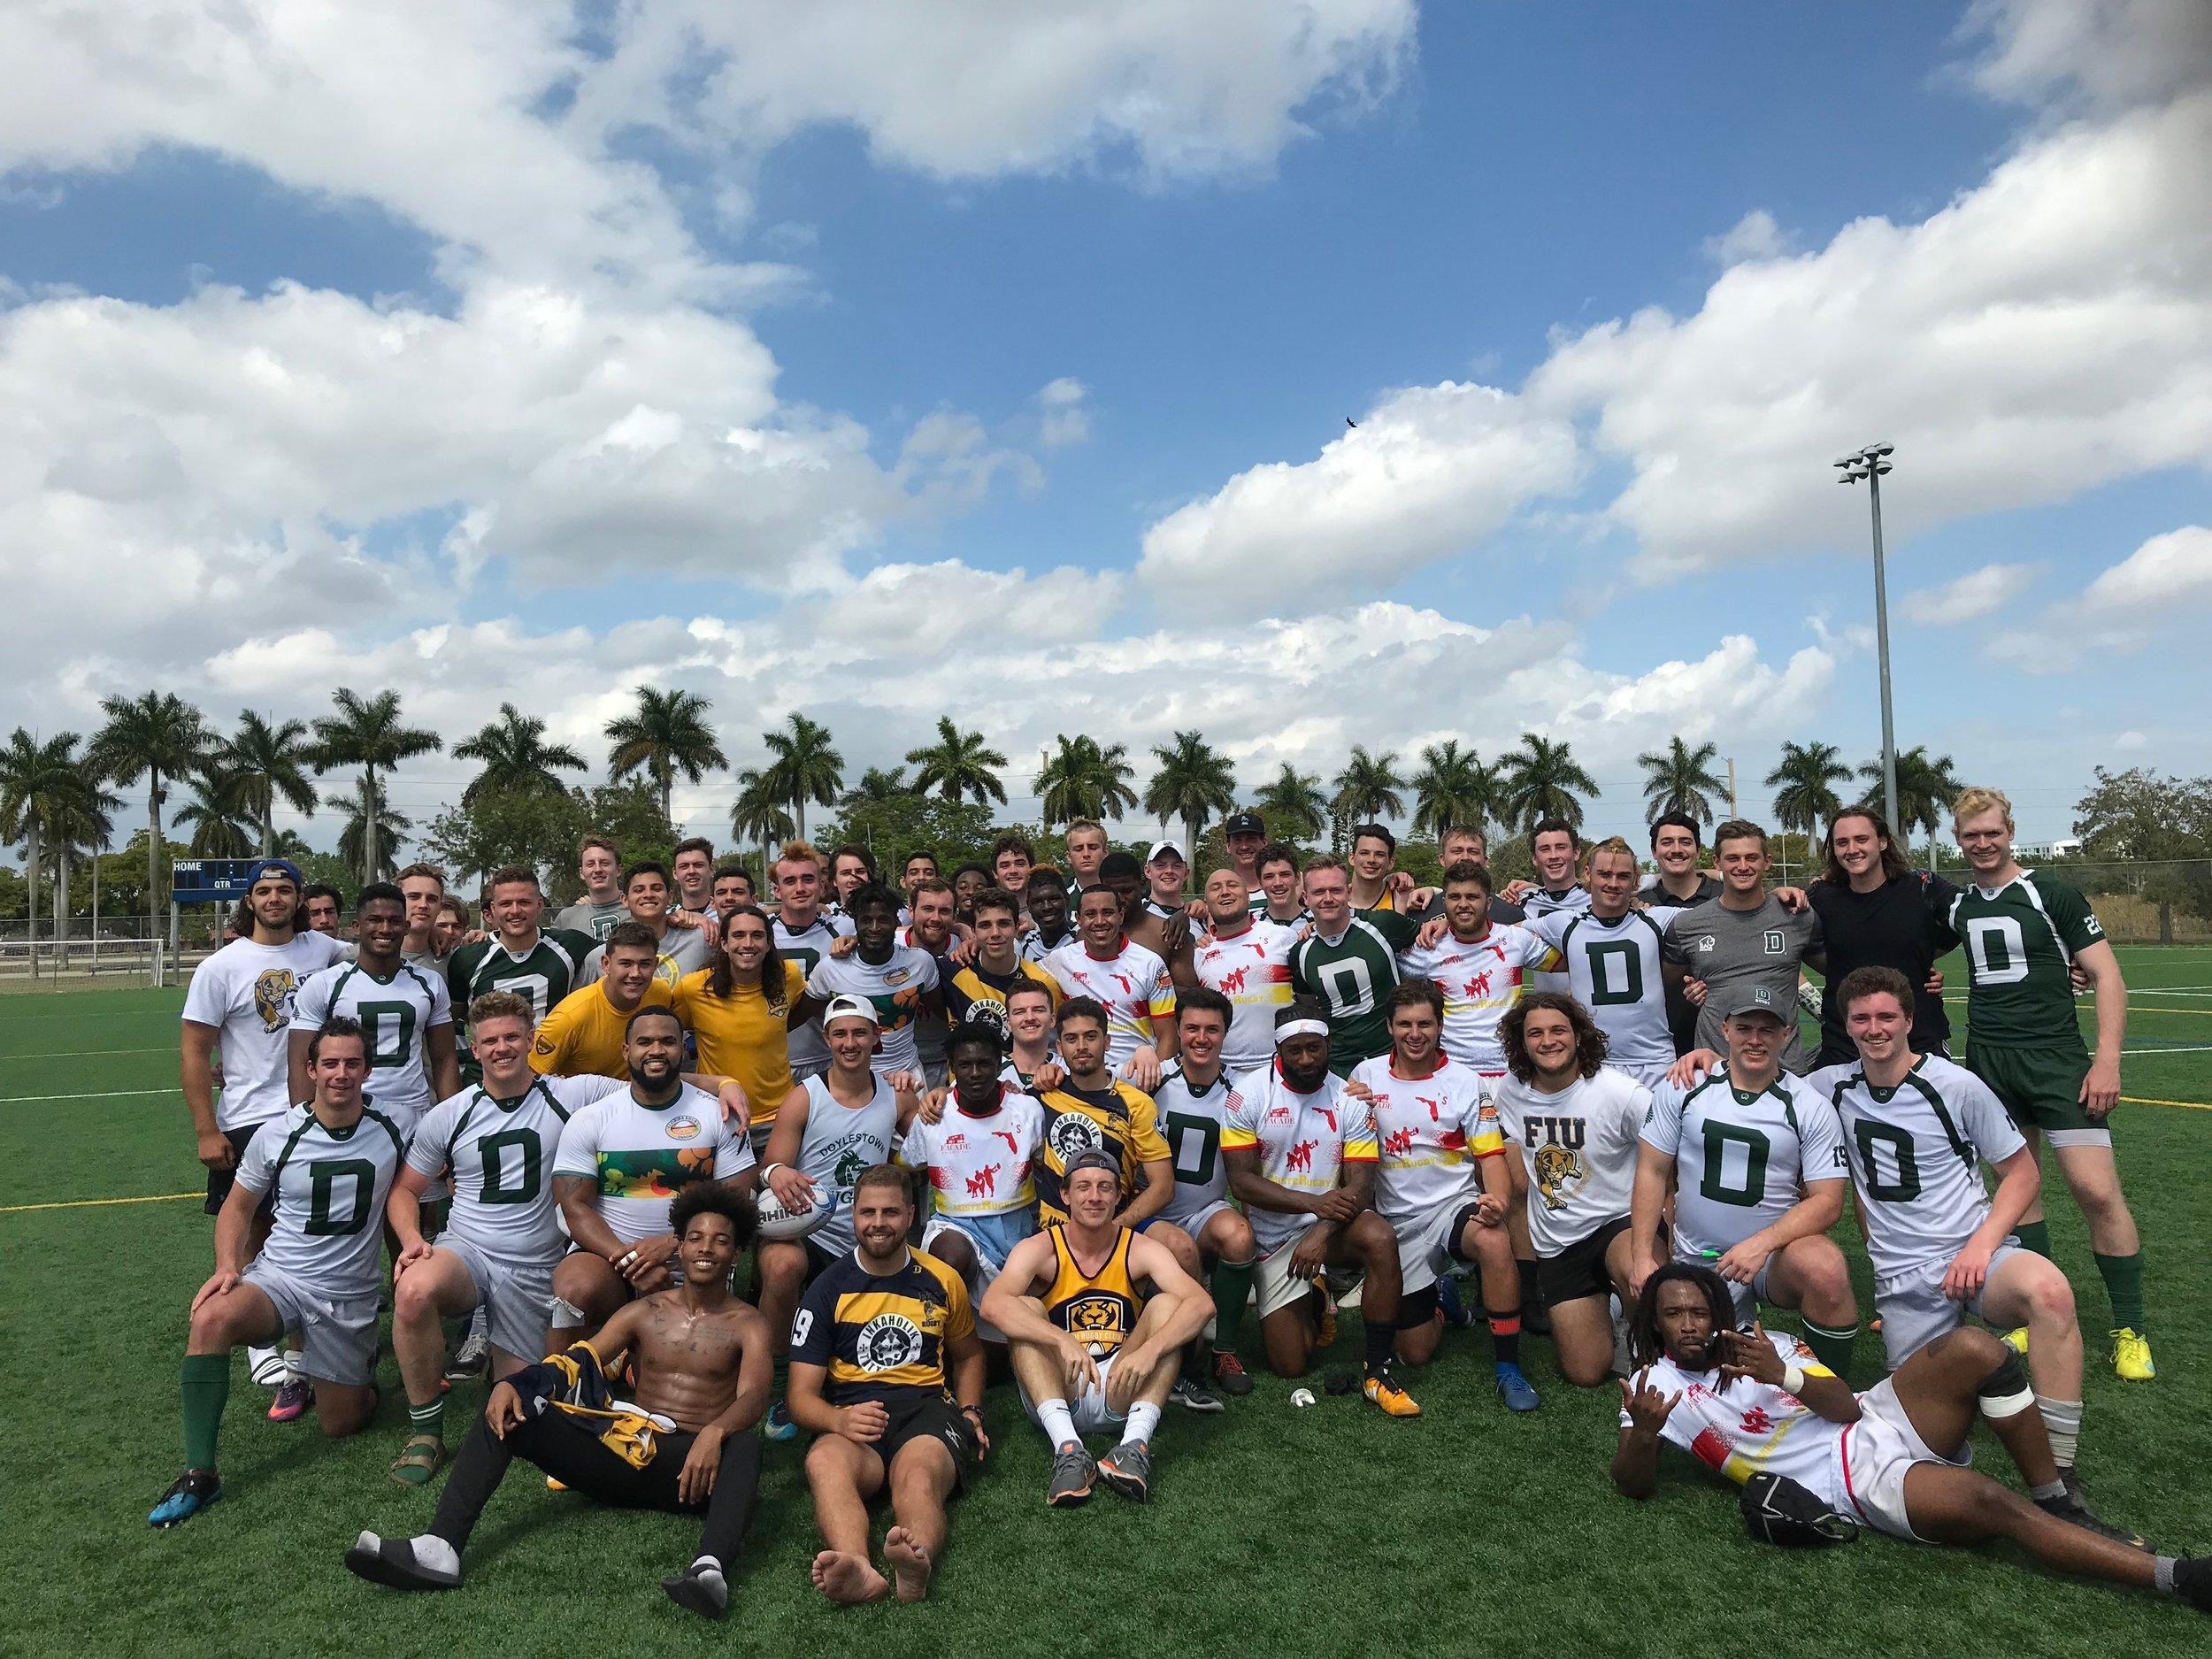 Team photo with Florida International University